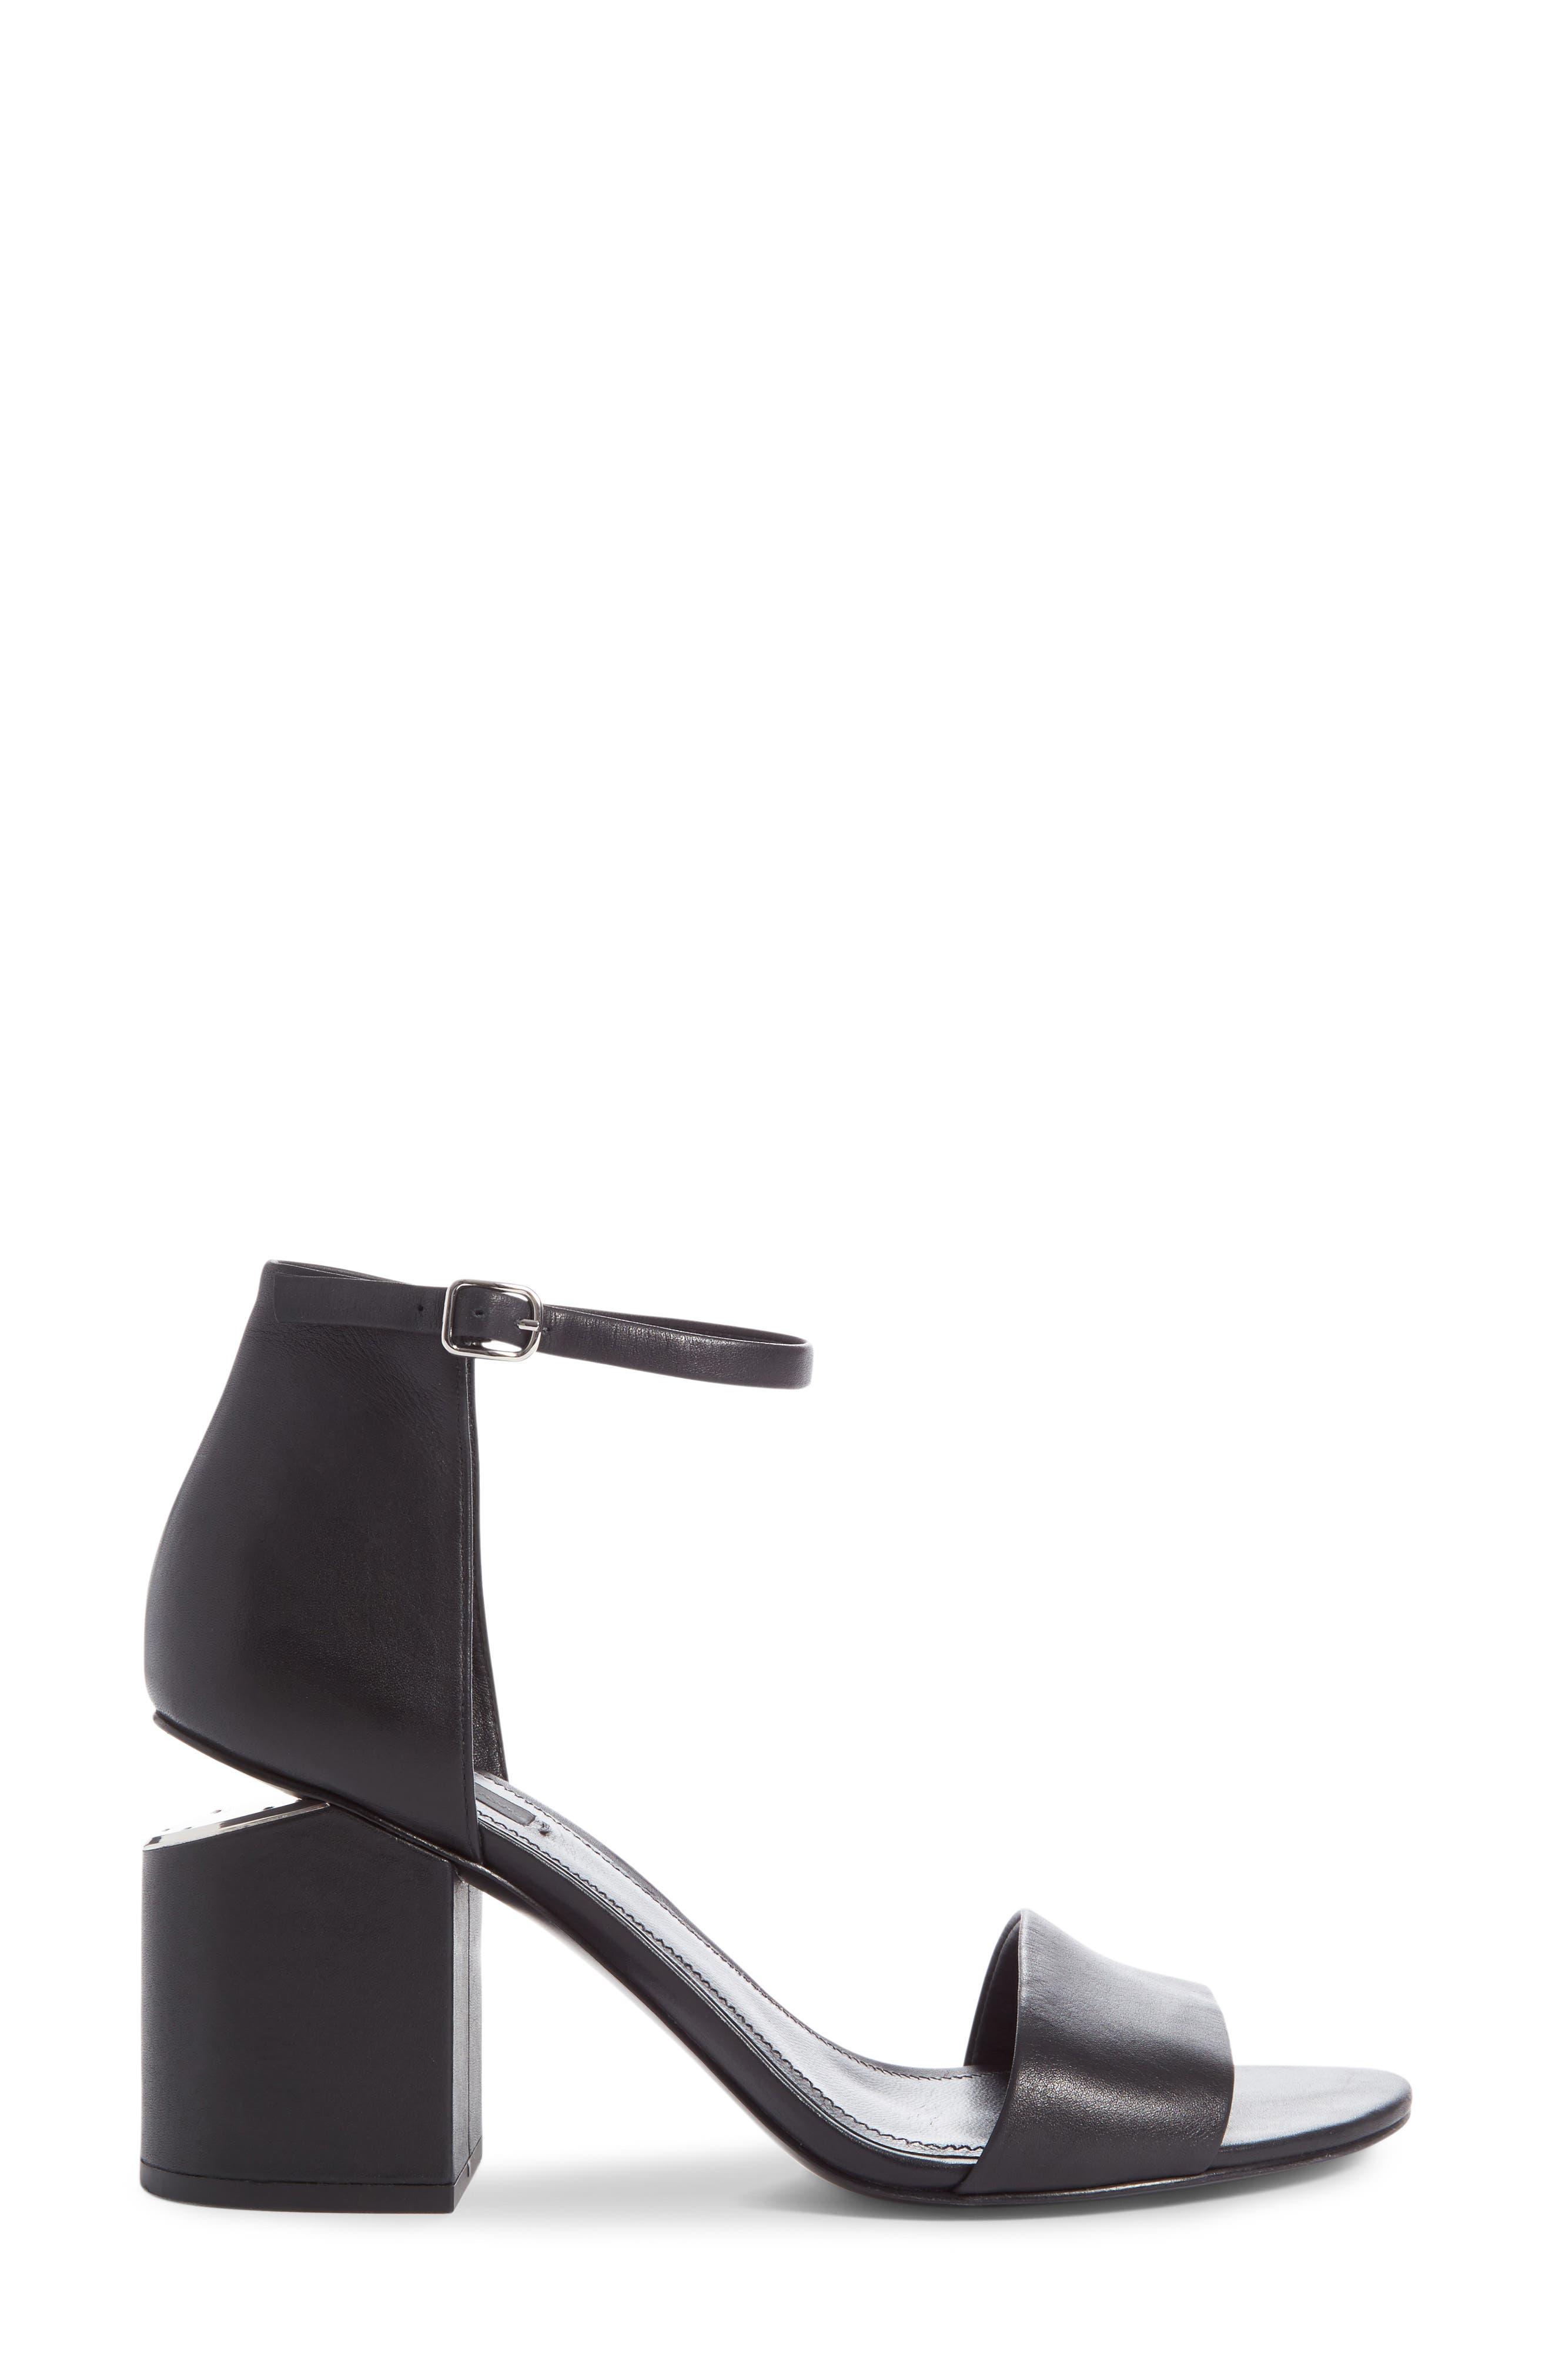 'Abby' Ankle Strap Sandal,                             Alternate thumbnail 5, color,                             BLACK